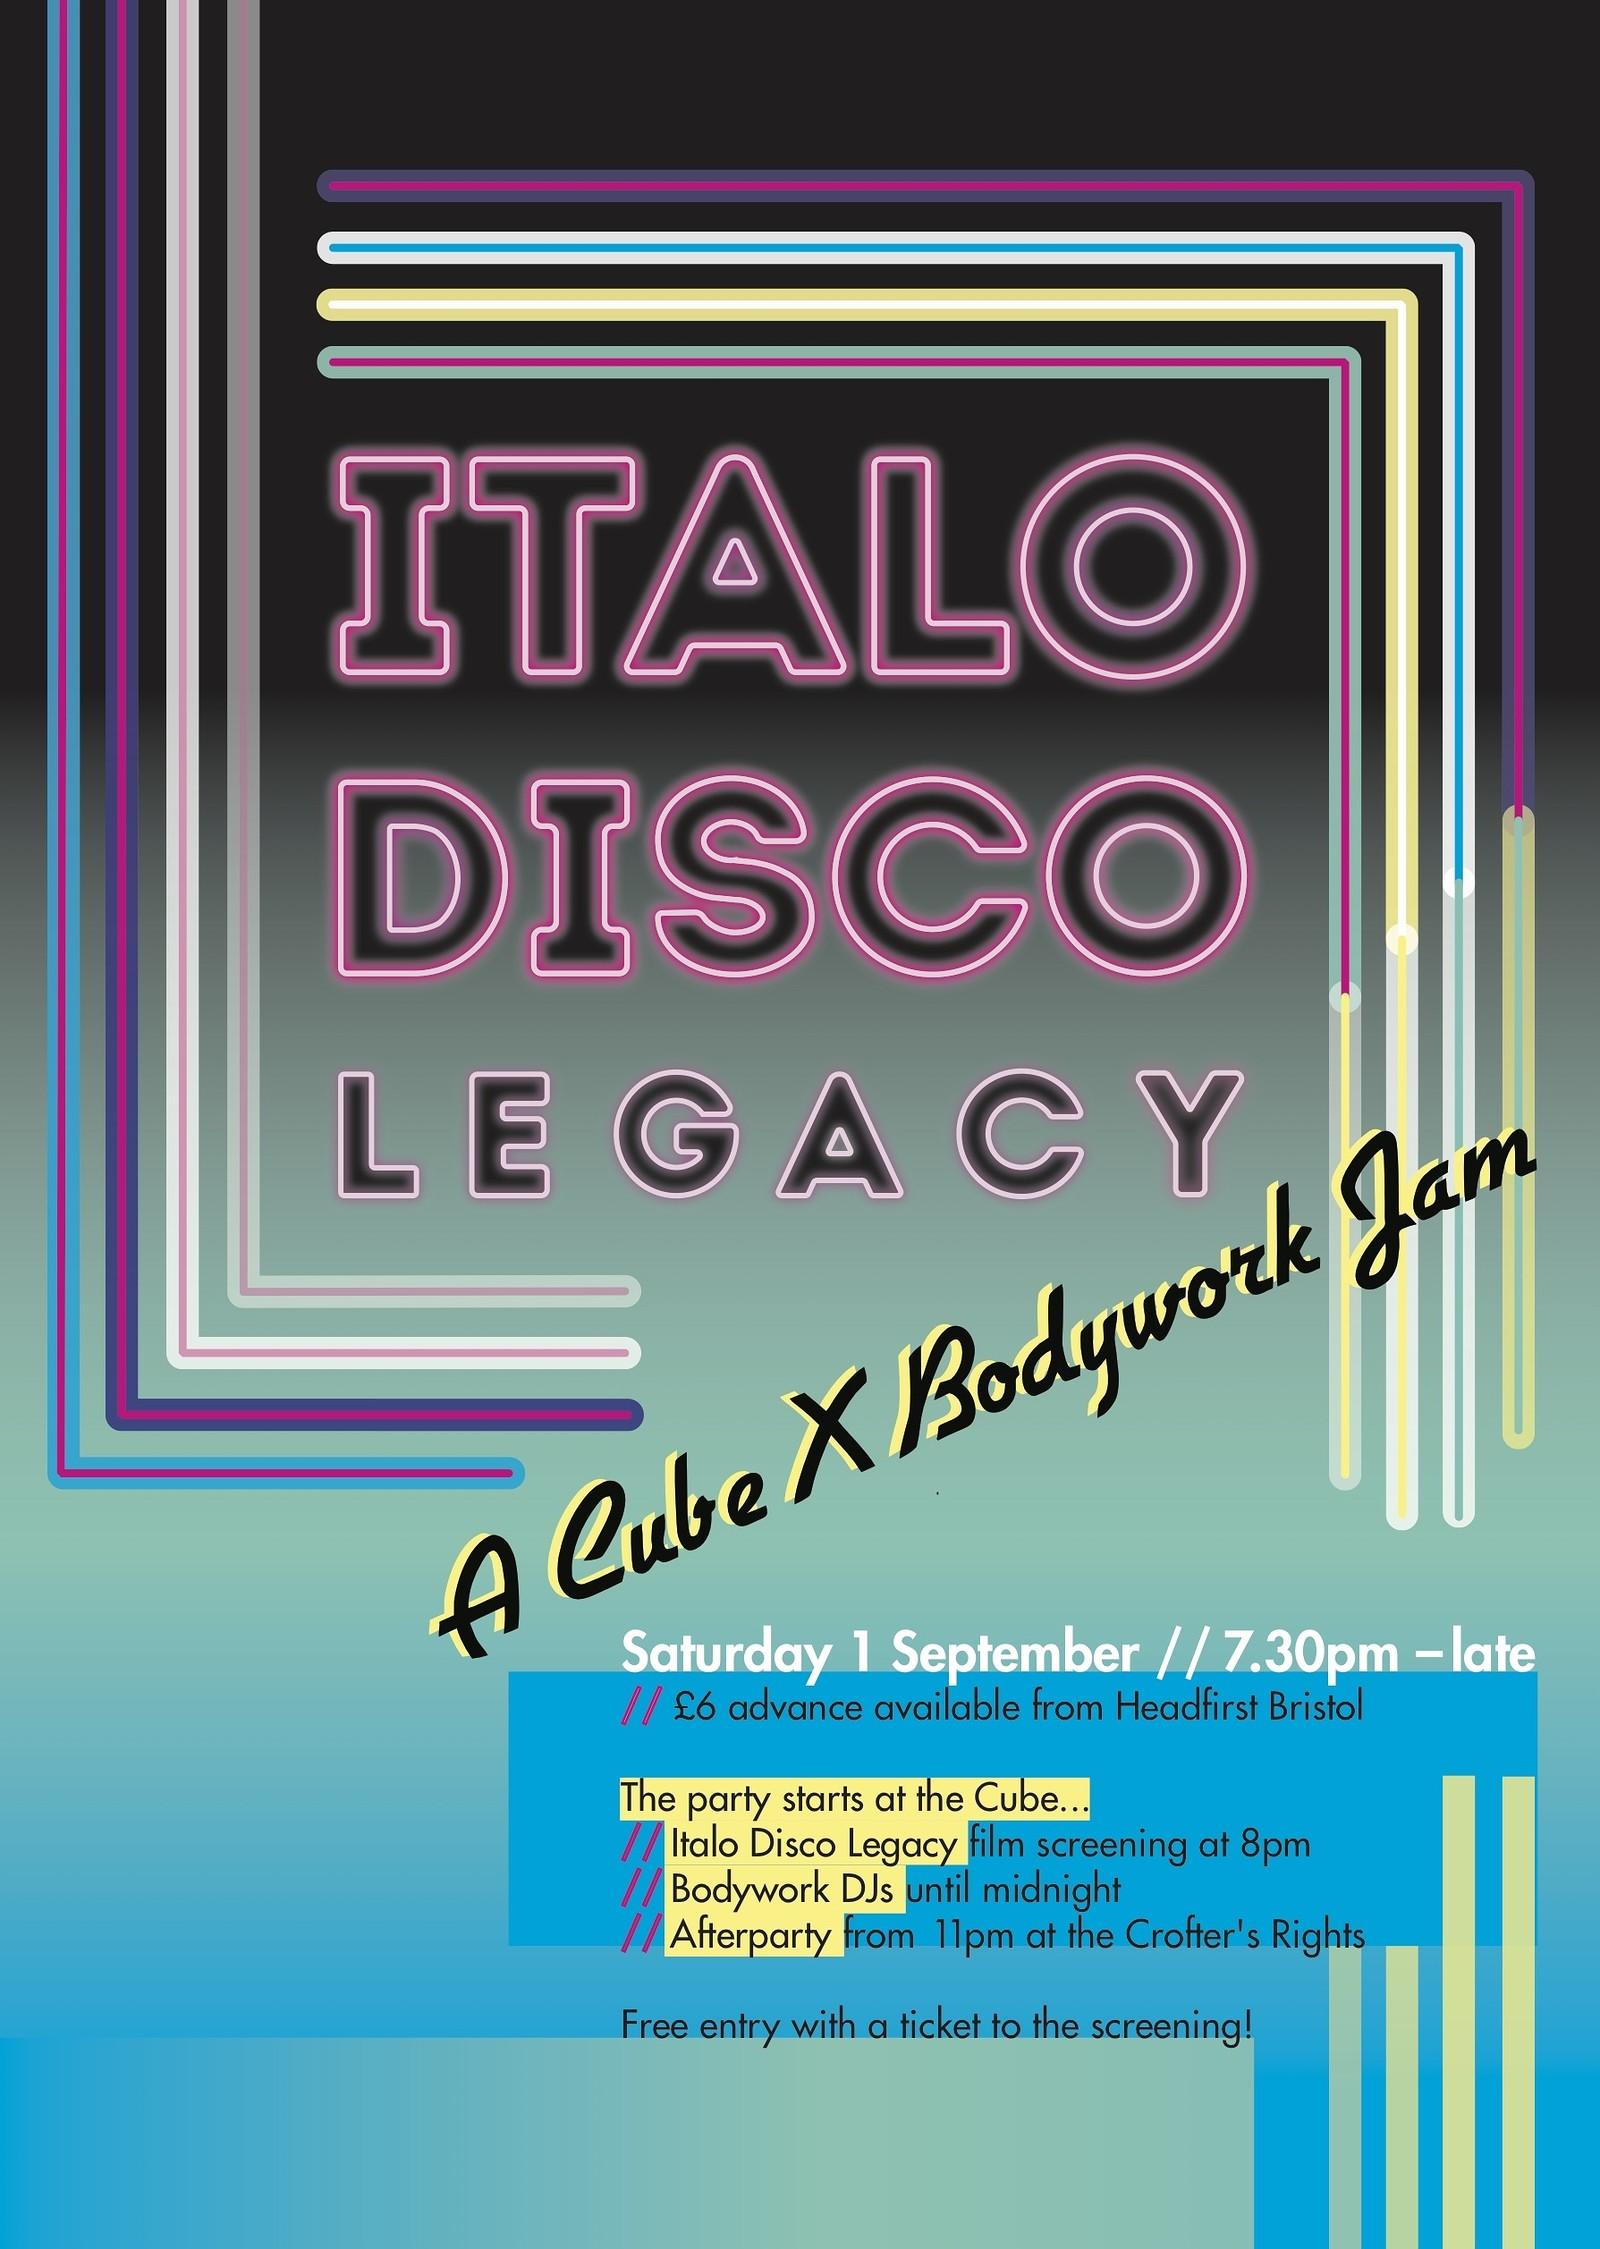 Italo disco uk